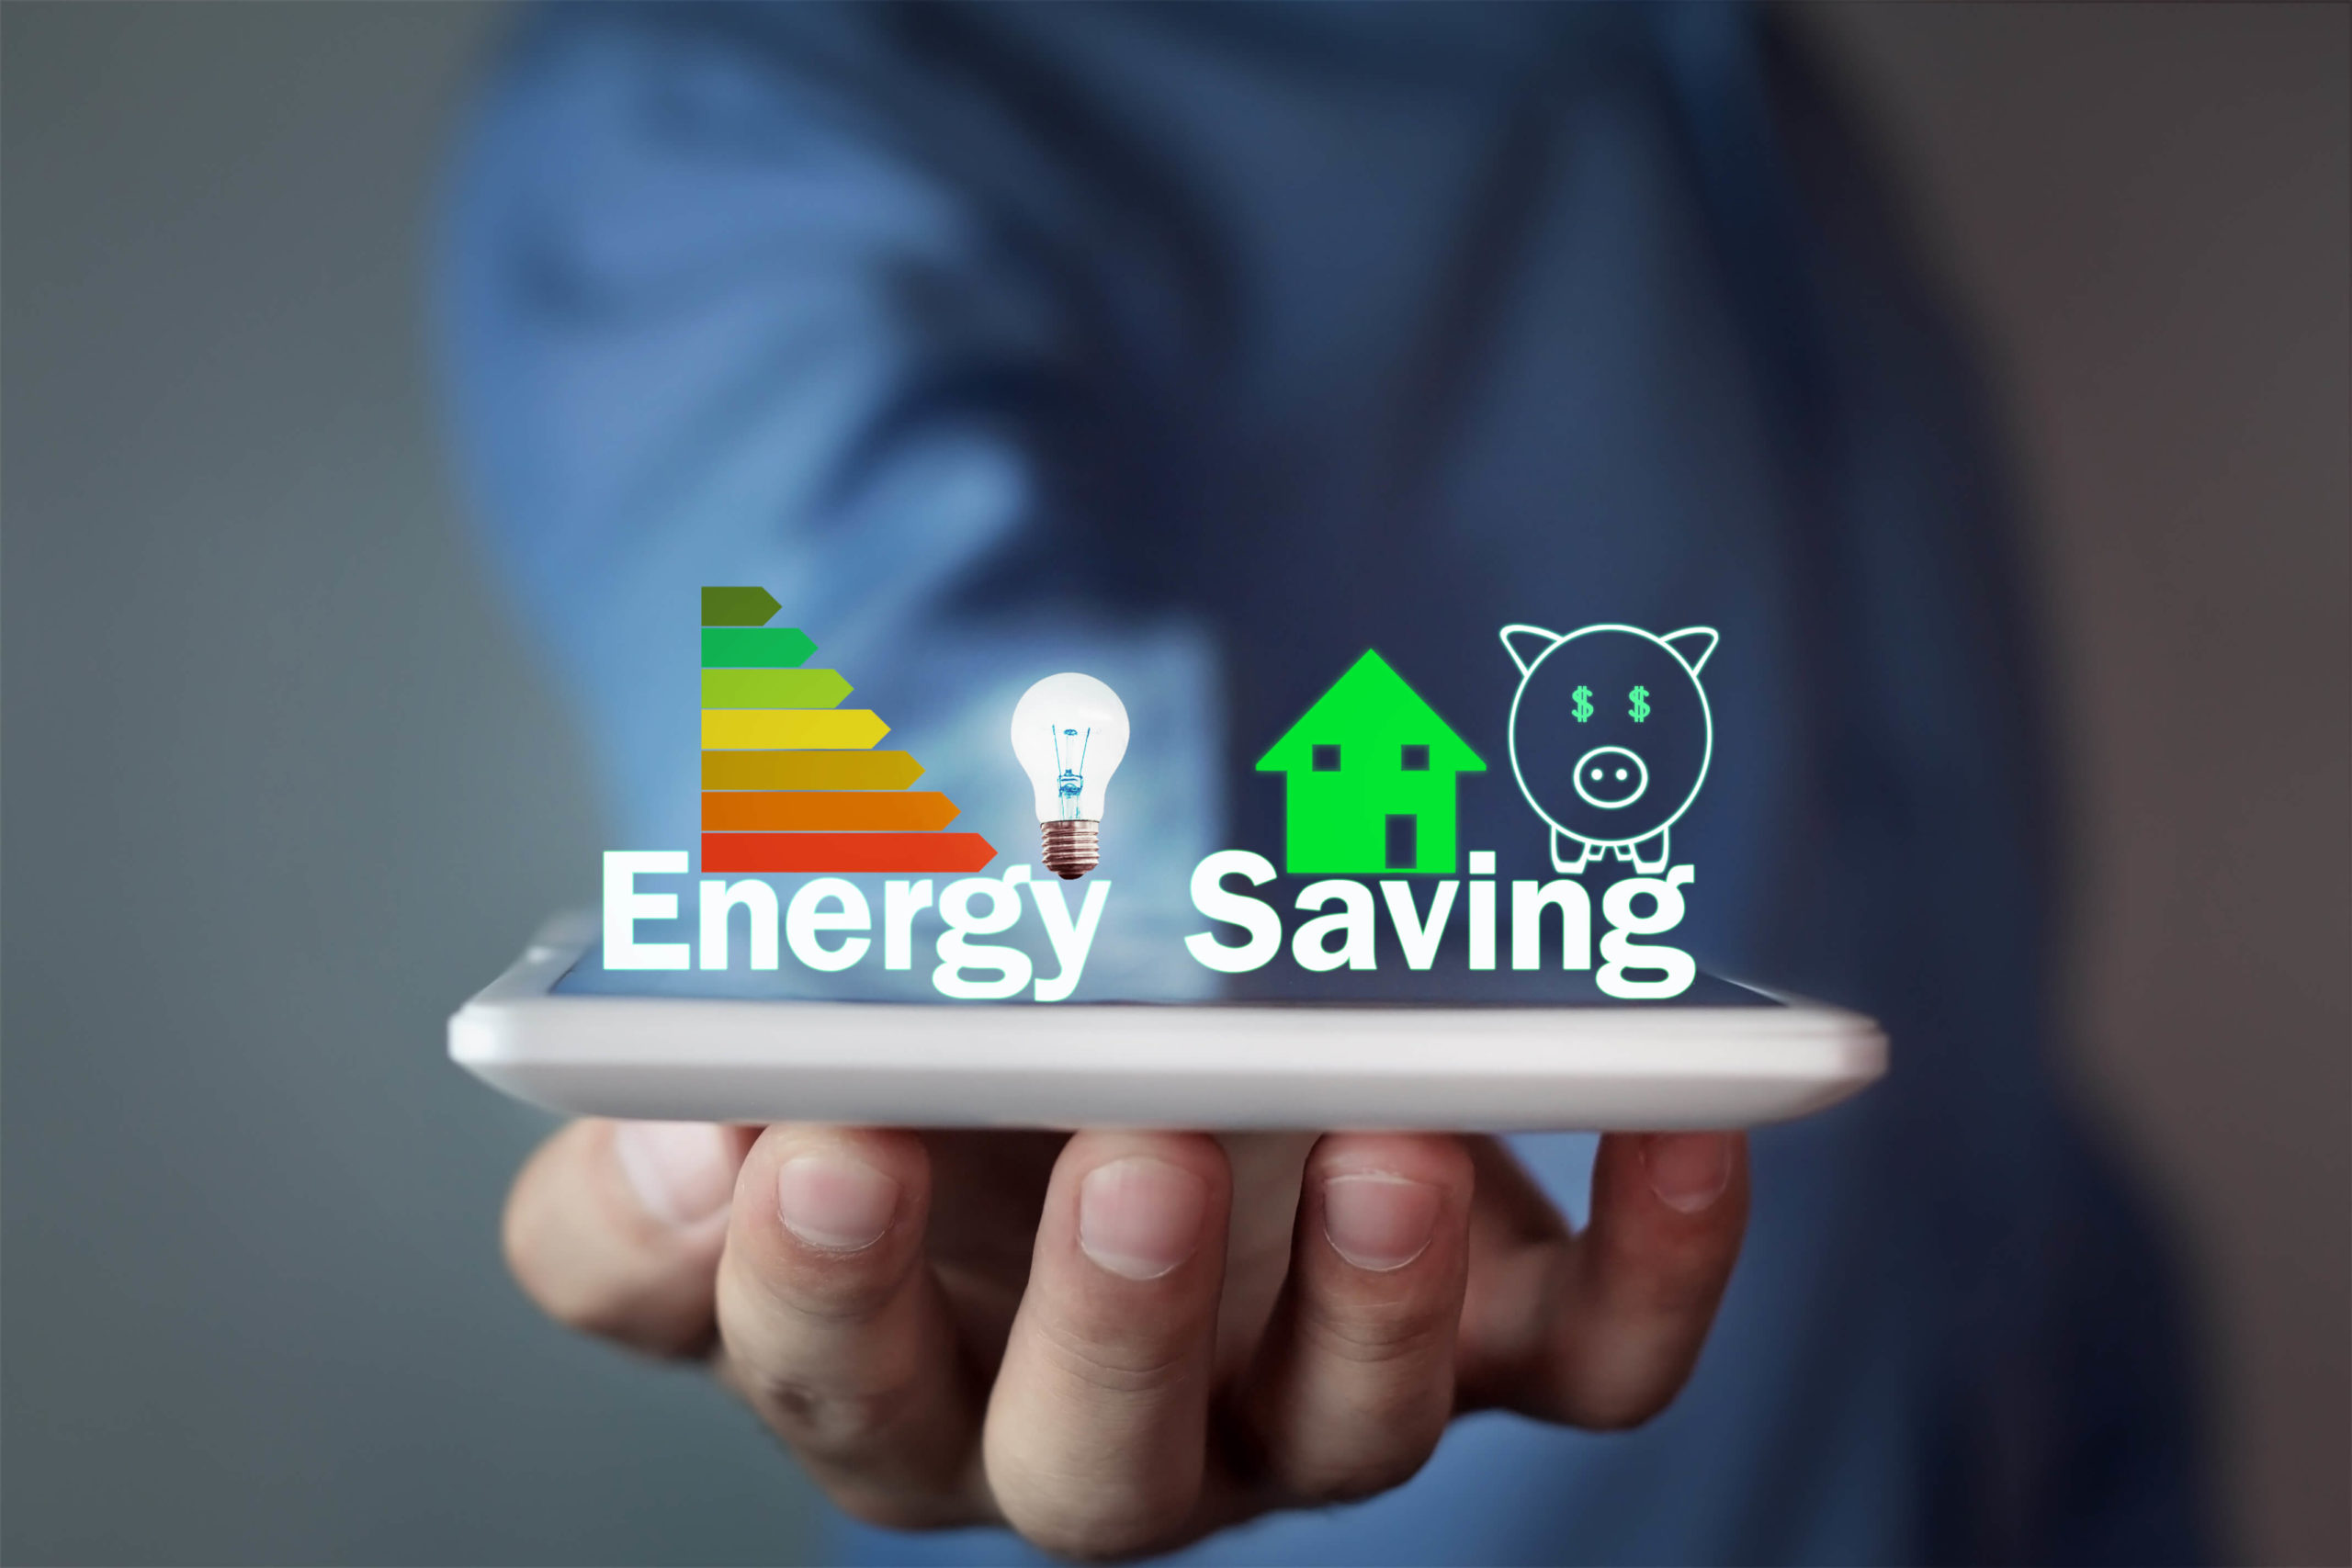 Energy Saving Graphic.